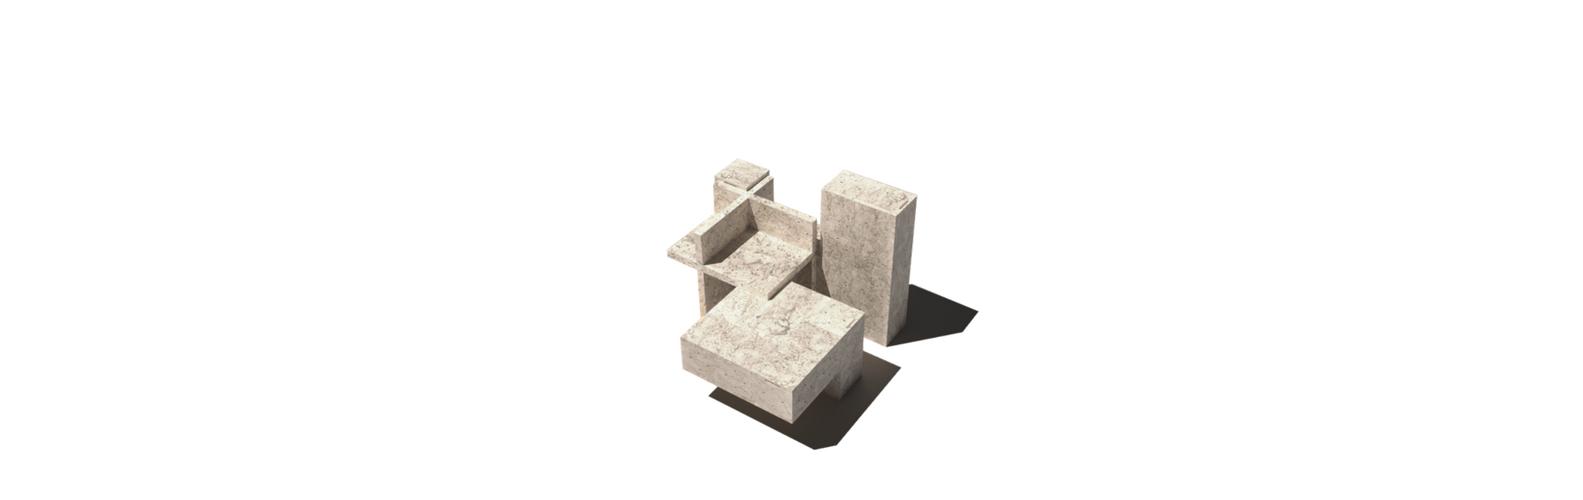 Cube - Cianciullo marmi